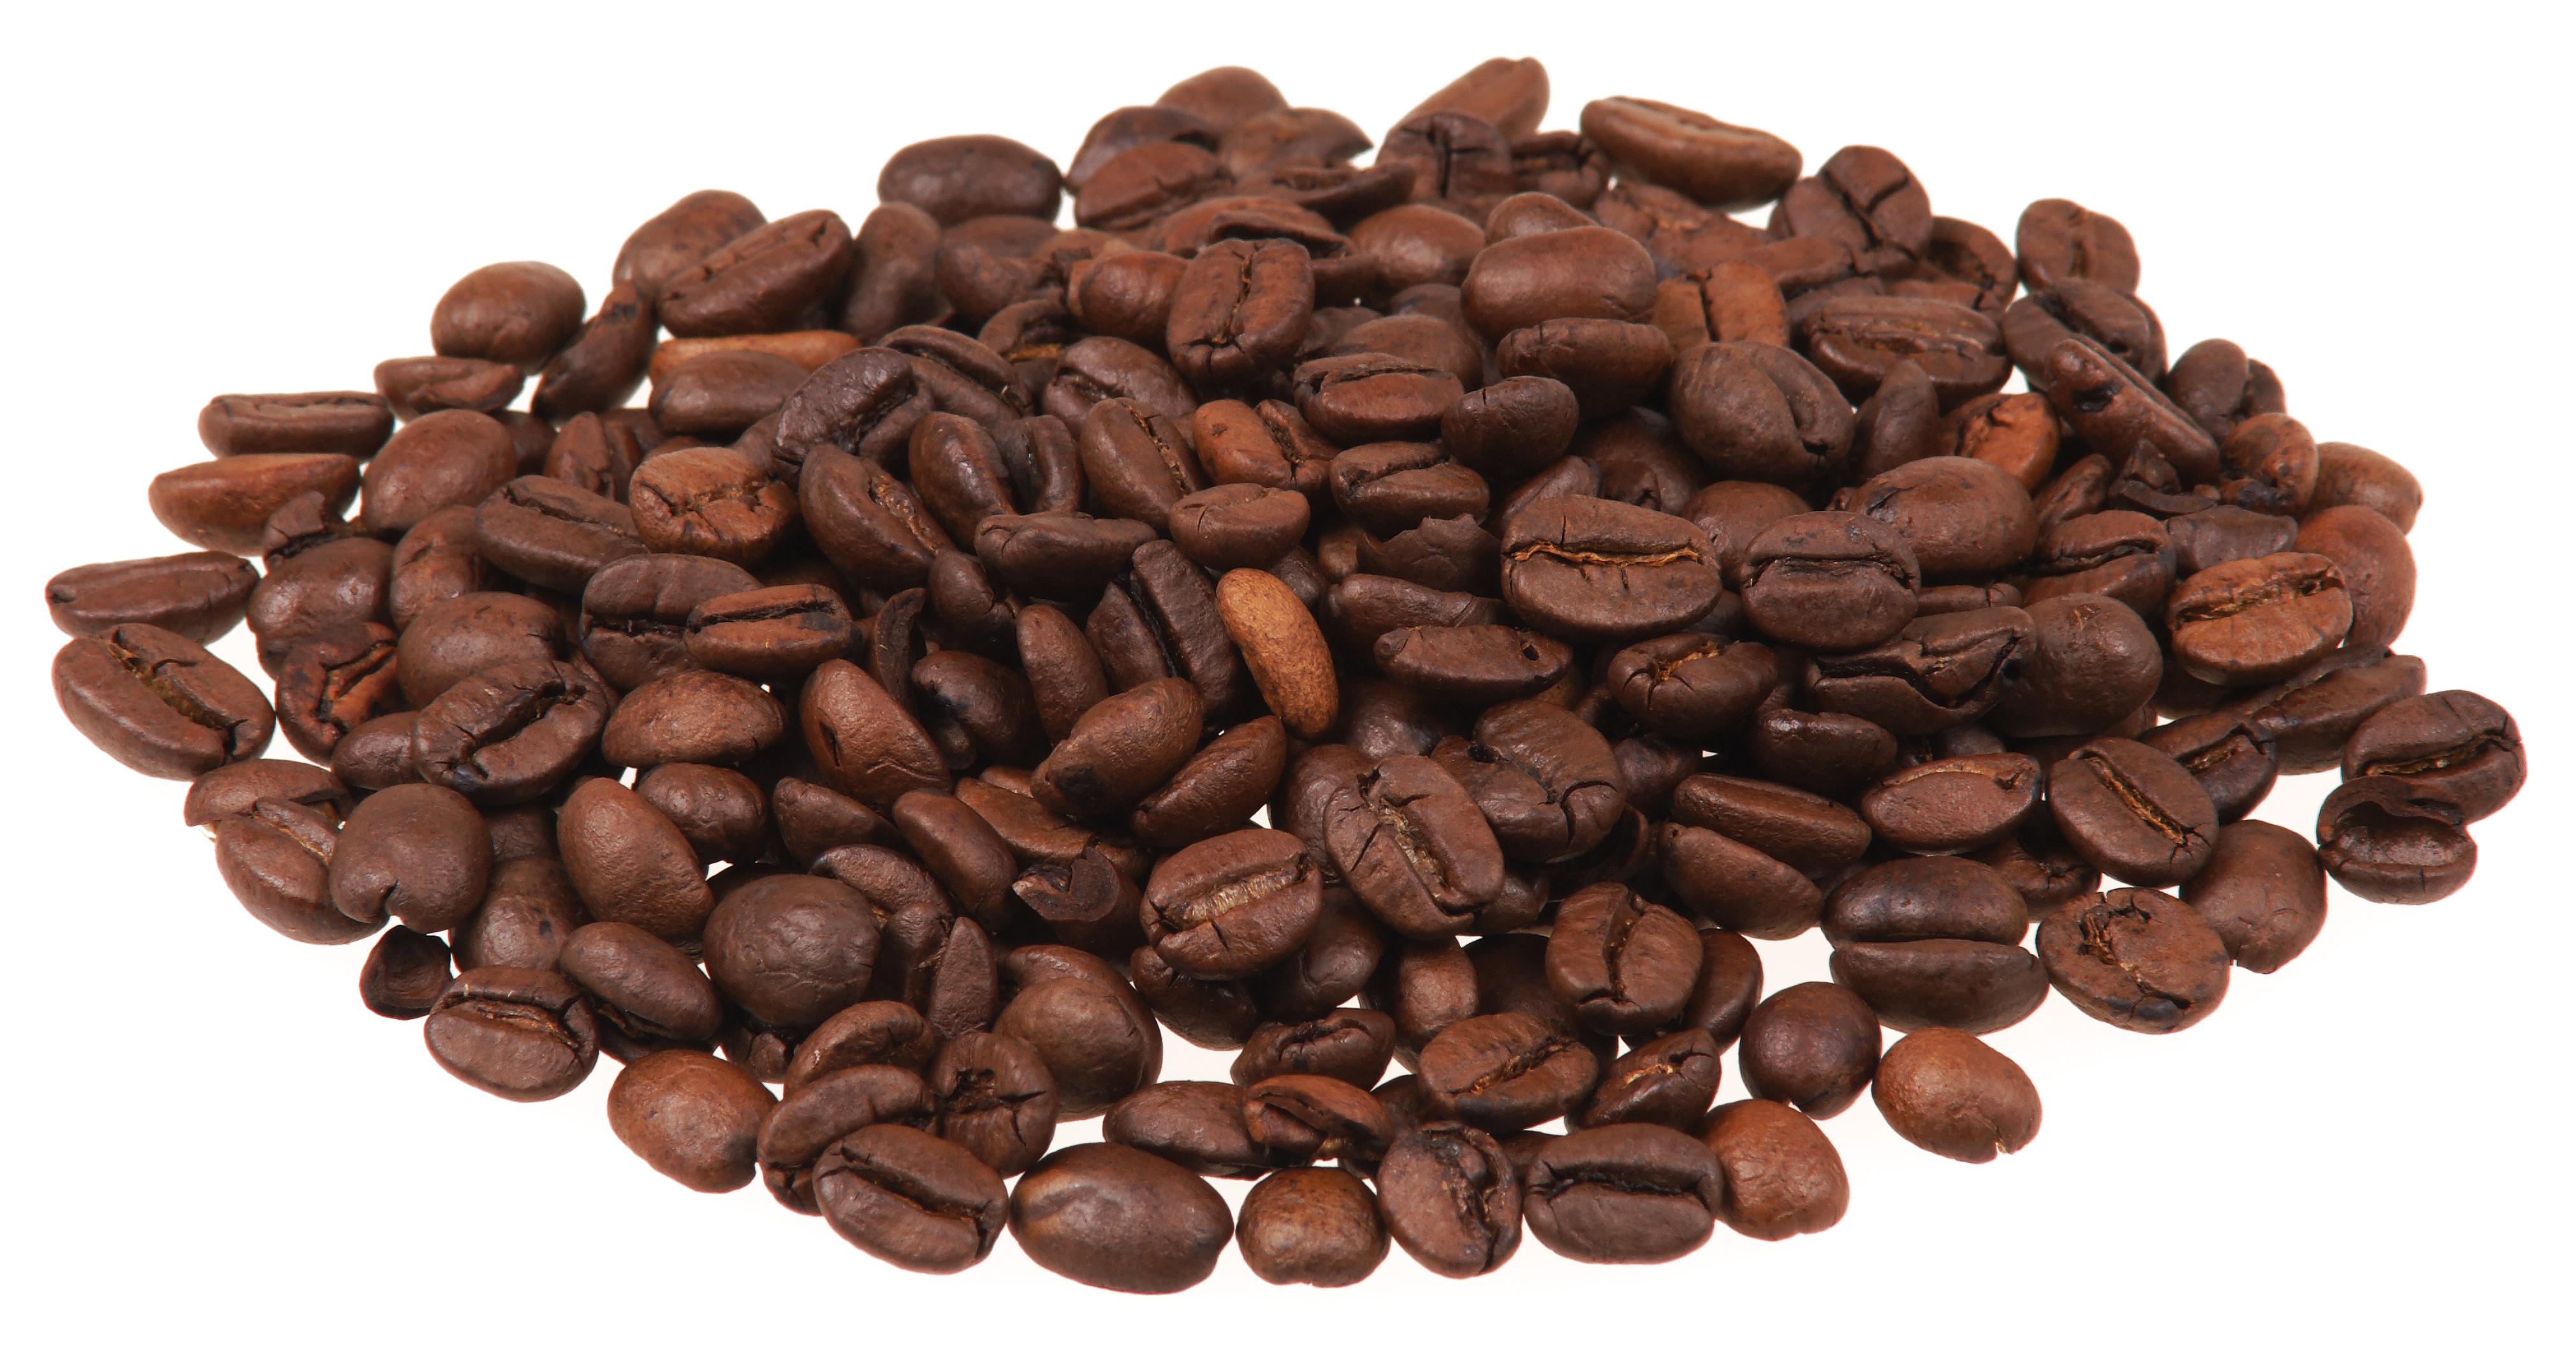 File:Coffee-Beans.jpg - Wikimedia Commons